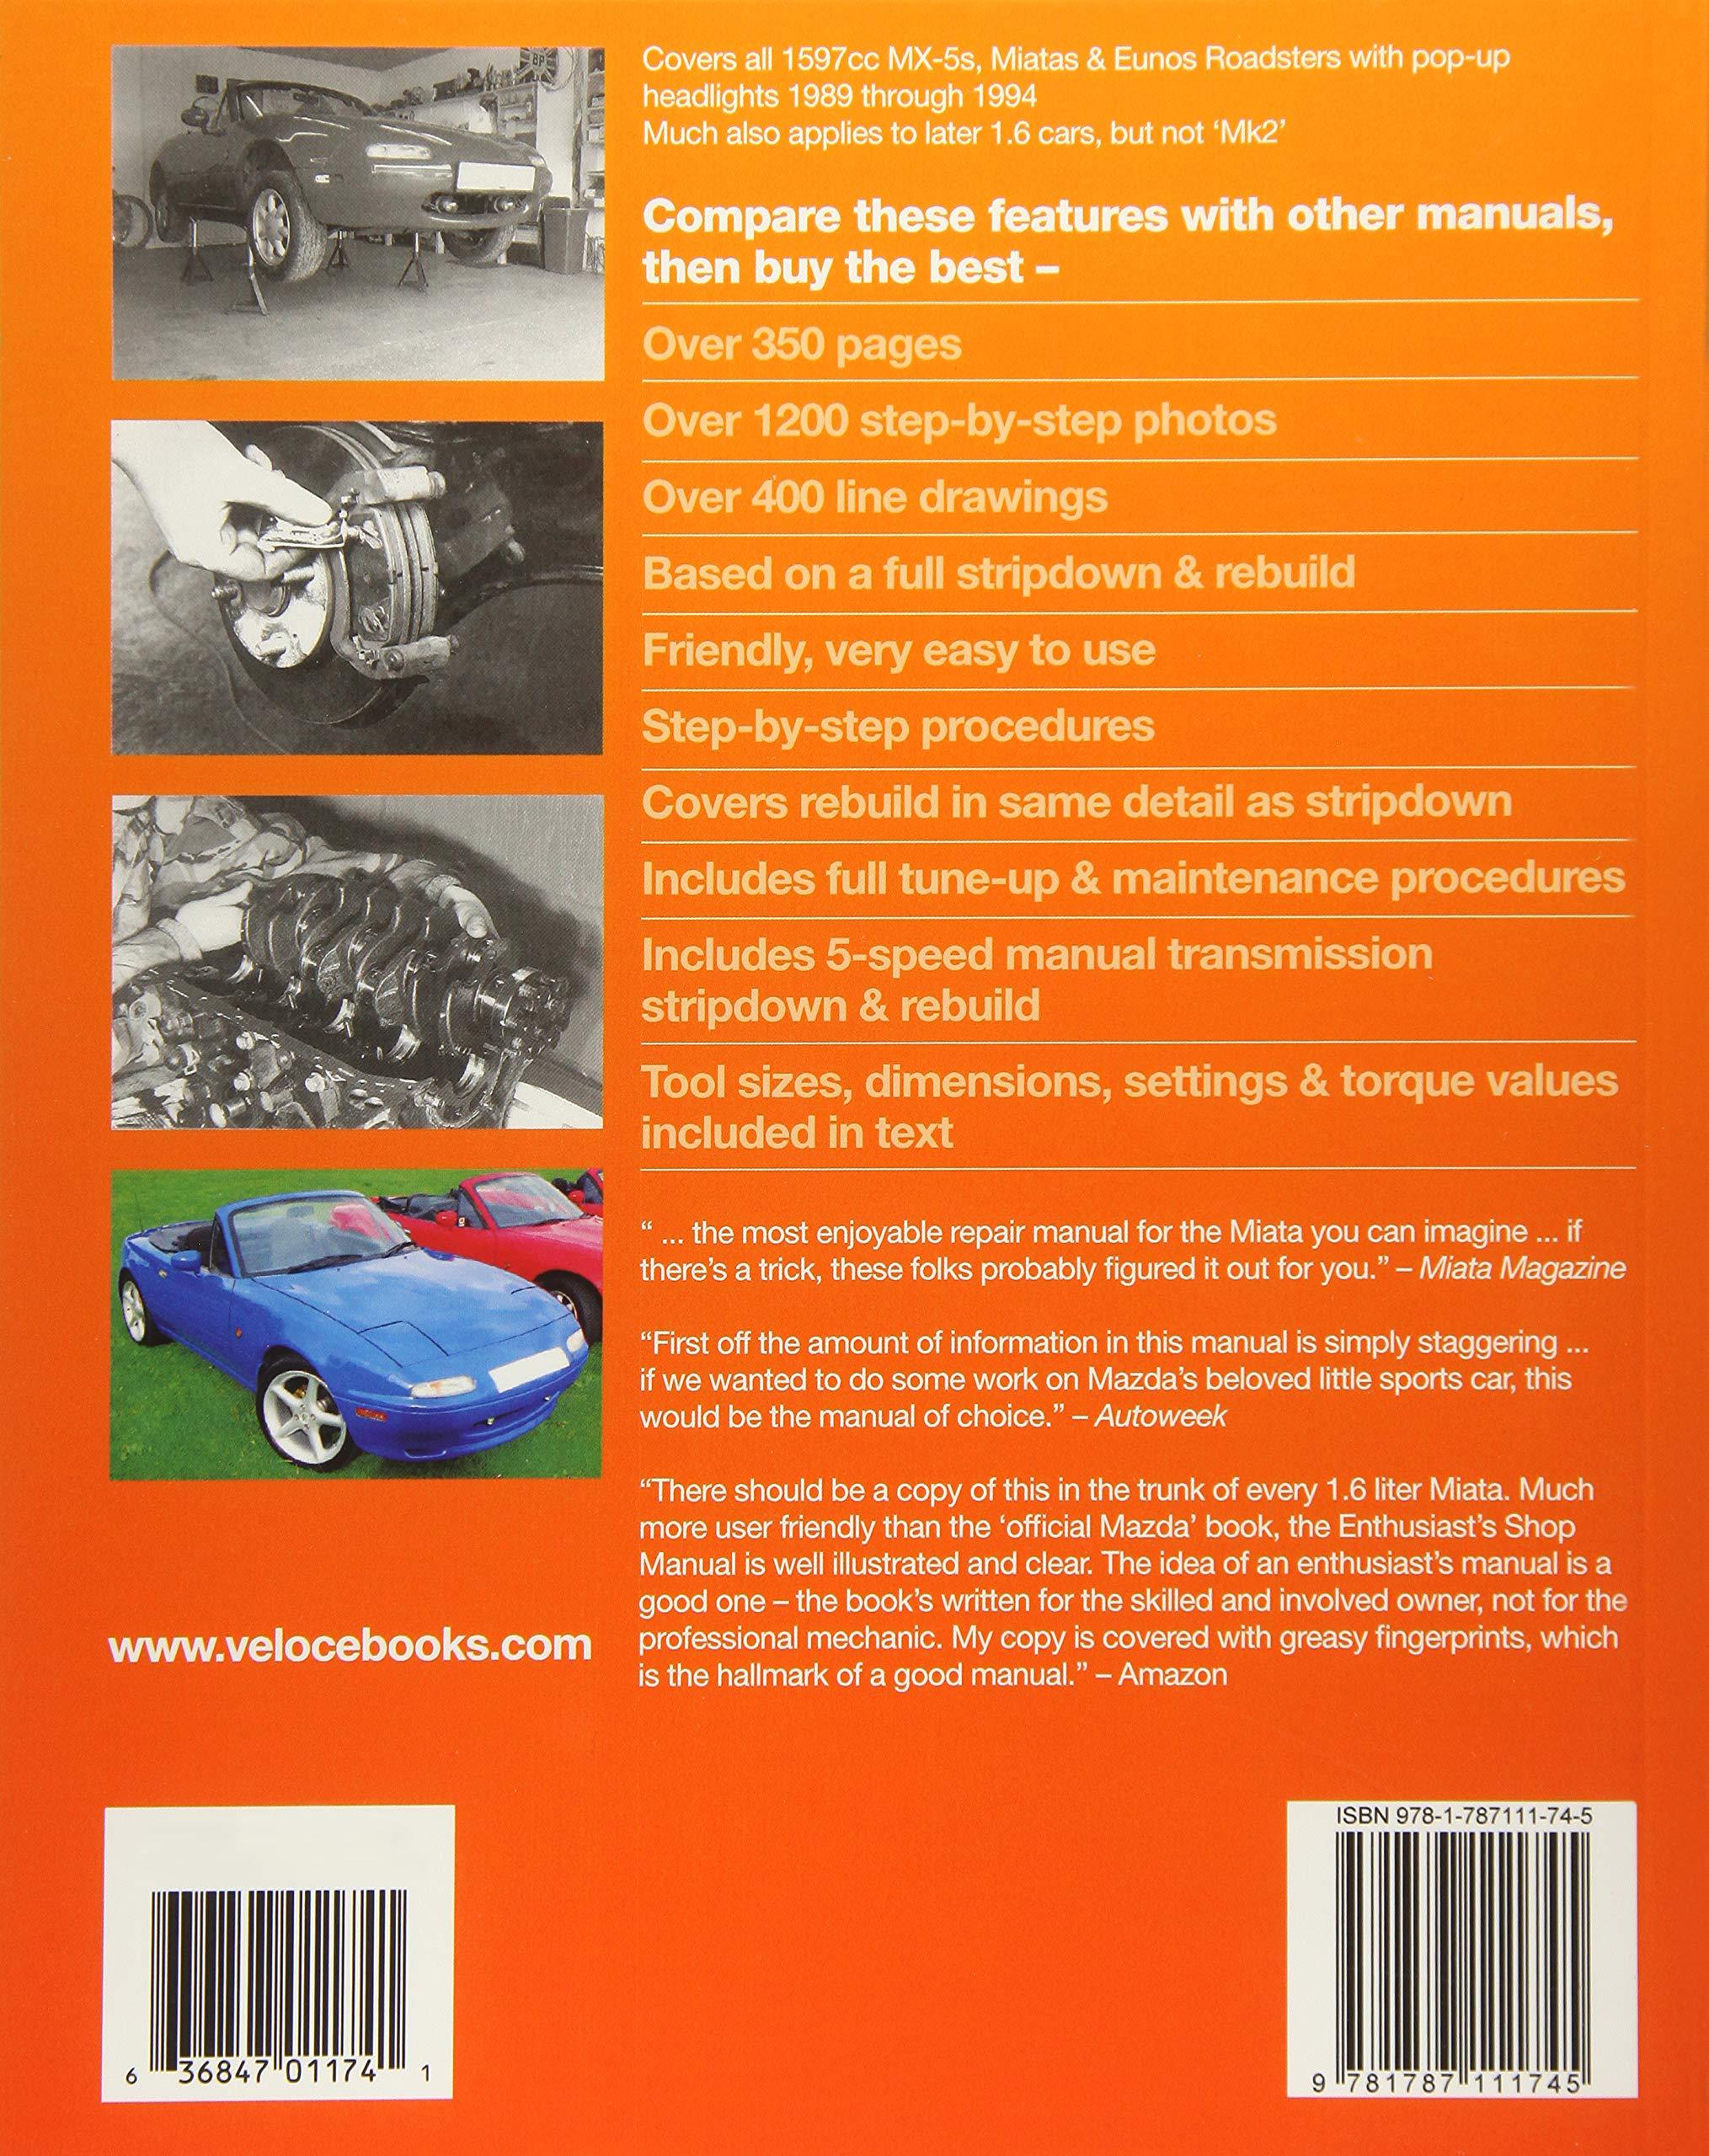 Mazda MX-5 Miata 1.6 Enthusiast's Workshop Manual (Enthusiast's Workshop  Manual series): Amazon.co.uk: Rod Grainger: 9781787111745: Books